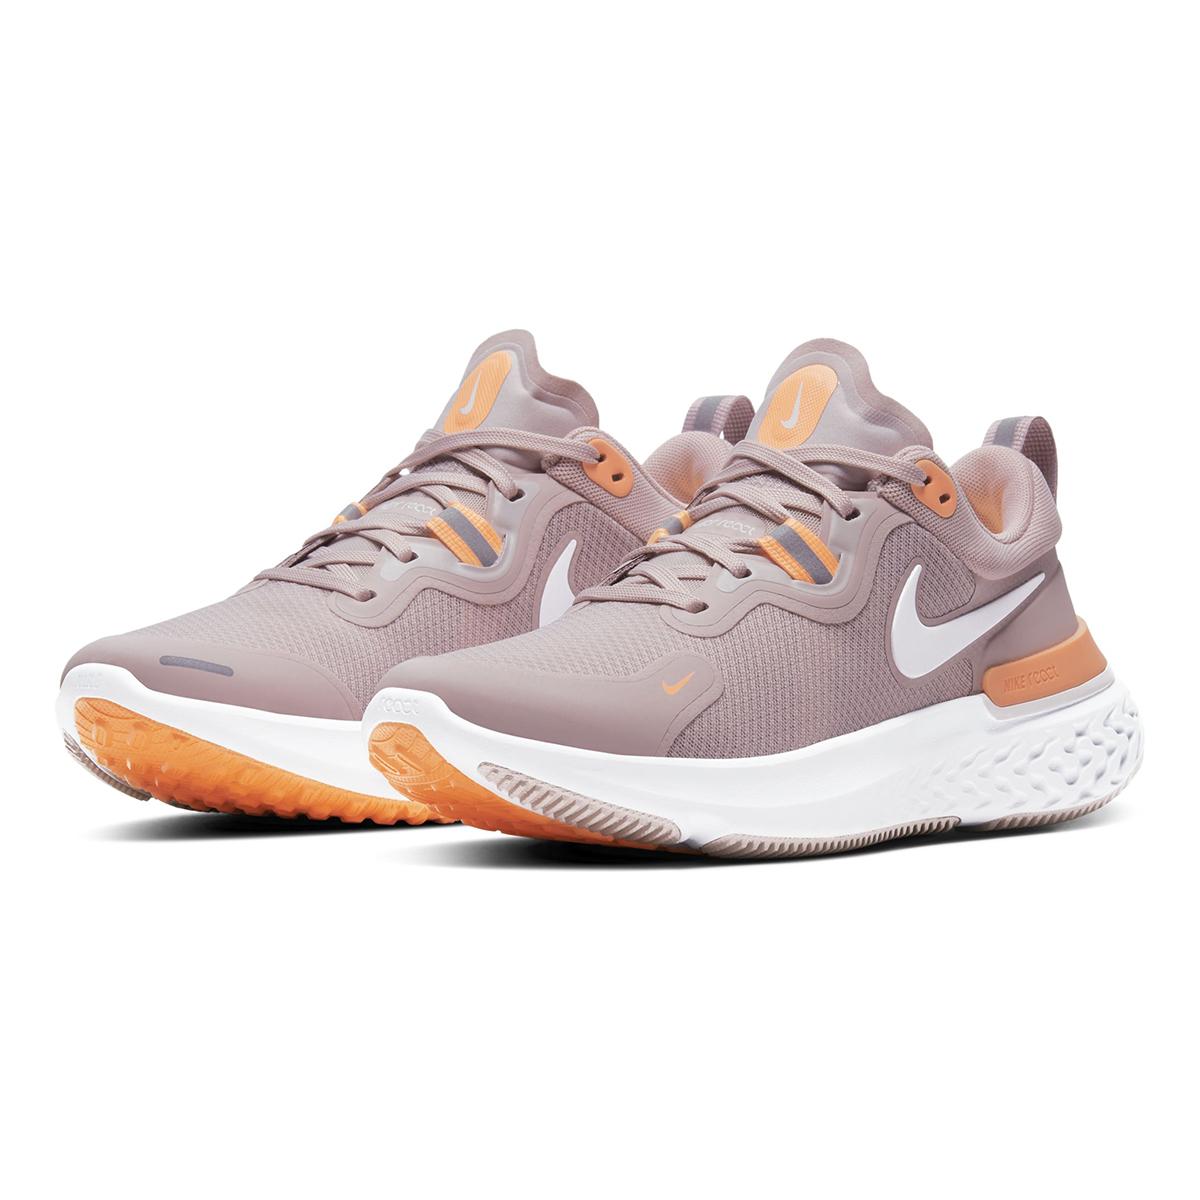 Women's Nike React Miler Running Shoe - Color: Champagne/Orange Pulse/Barely Rose/White (Regular Width) - Size: 5, Champagne/Orange Pulse/Barely Rose/White, large, image 4